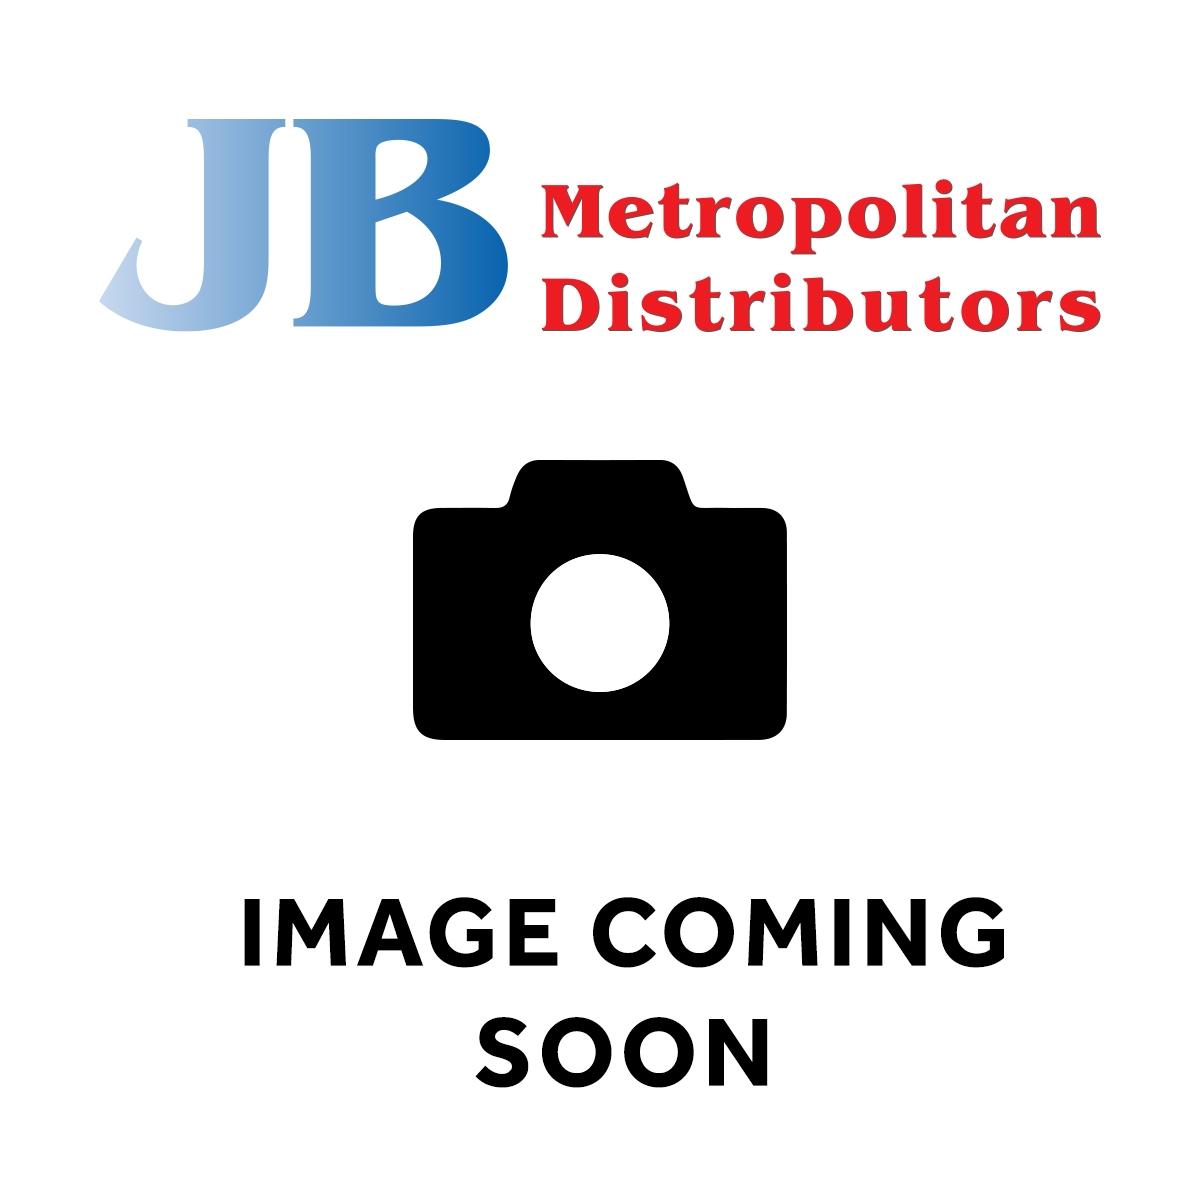 BUNDABERG SPICED GINGER BEER 375ML 4 PACK